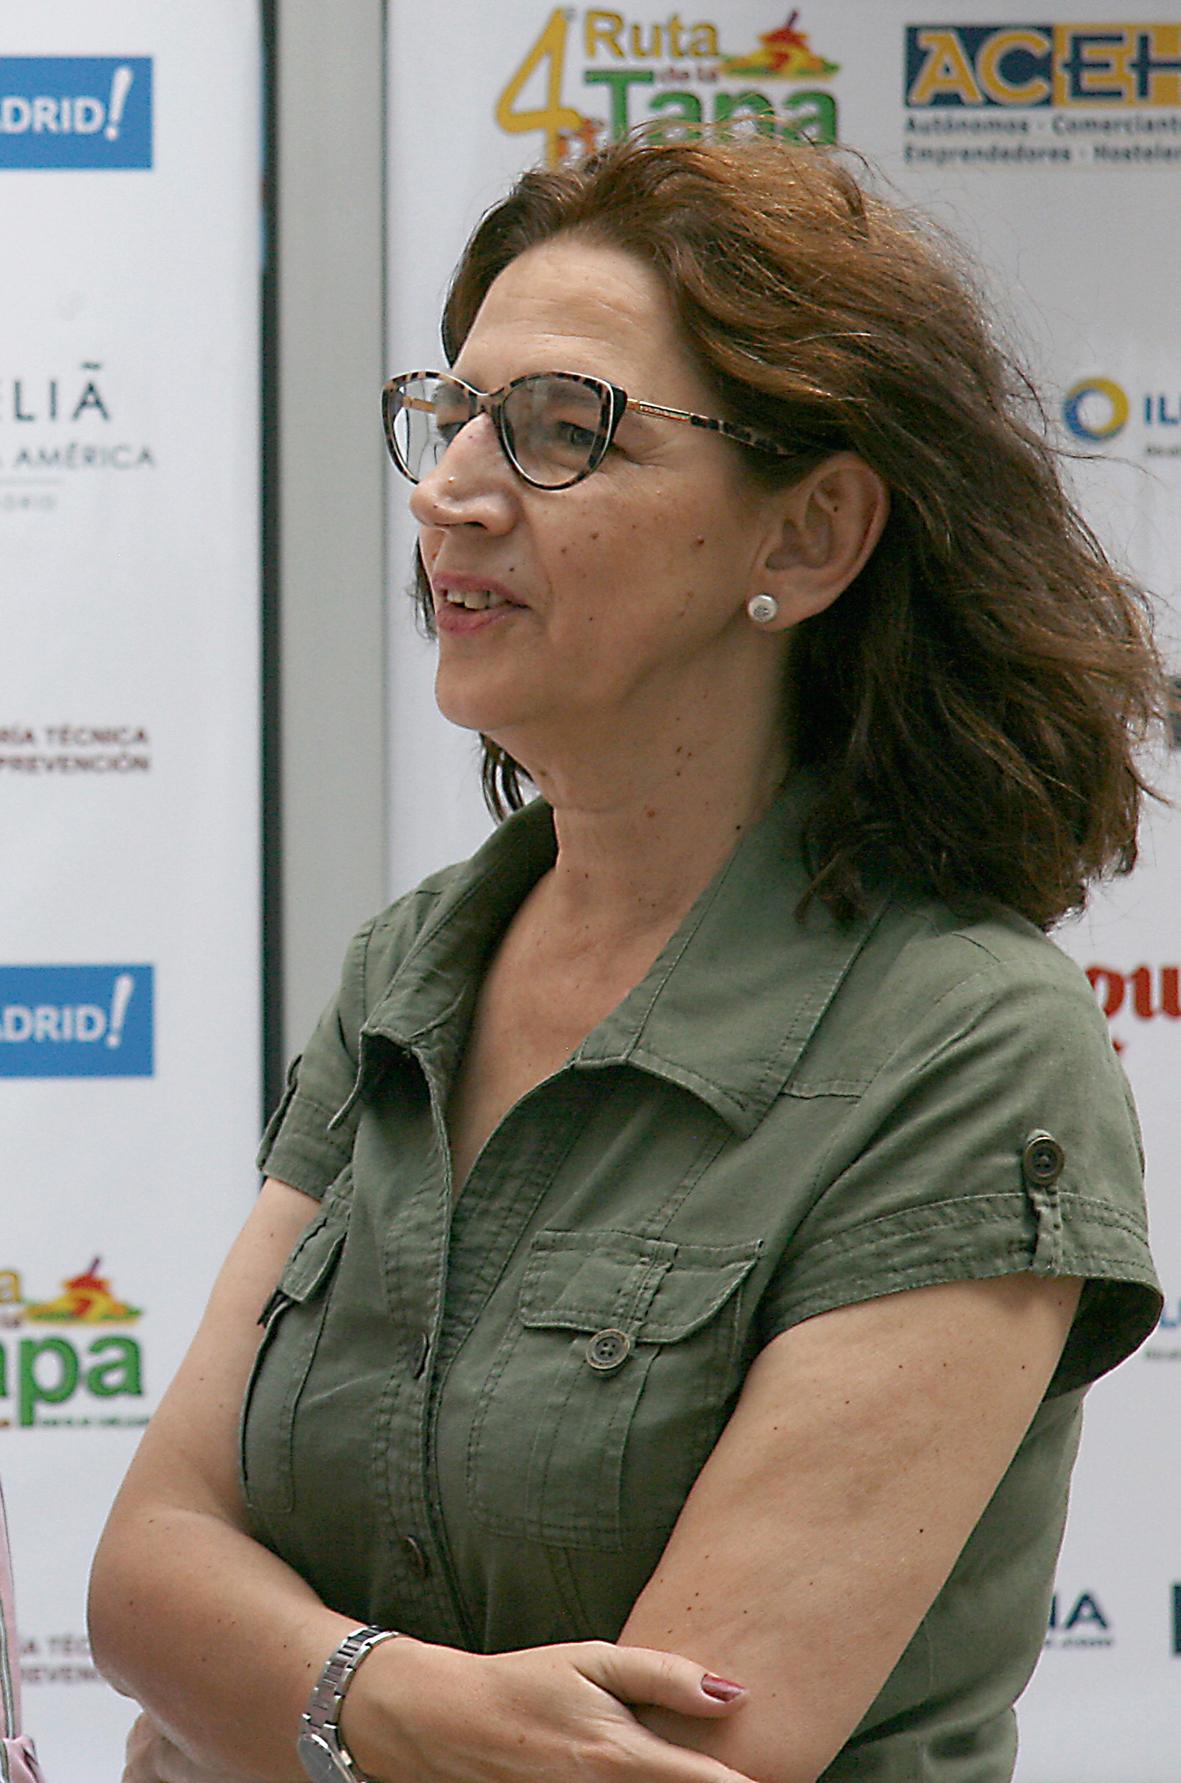 Teresa Paredes